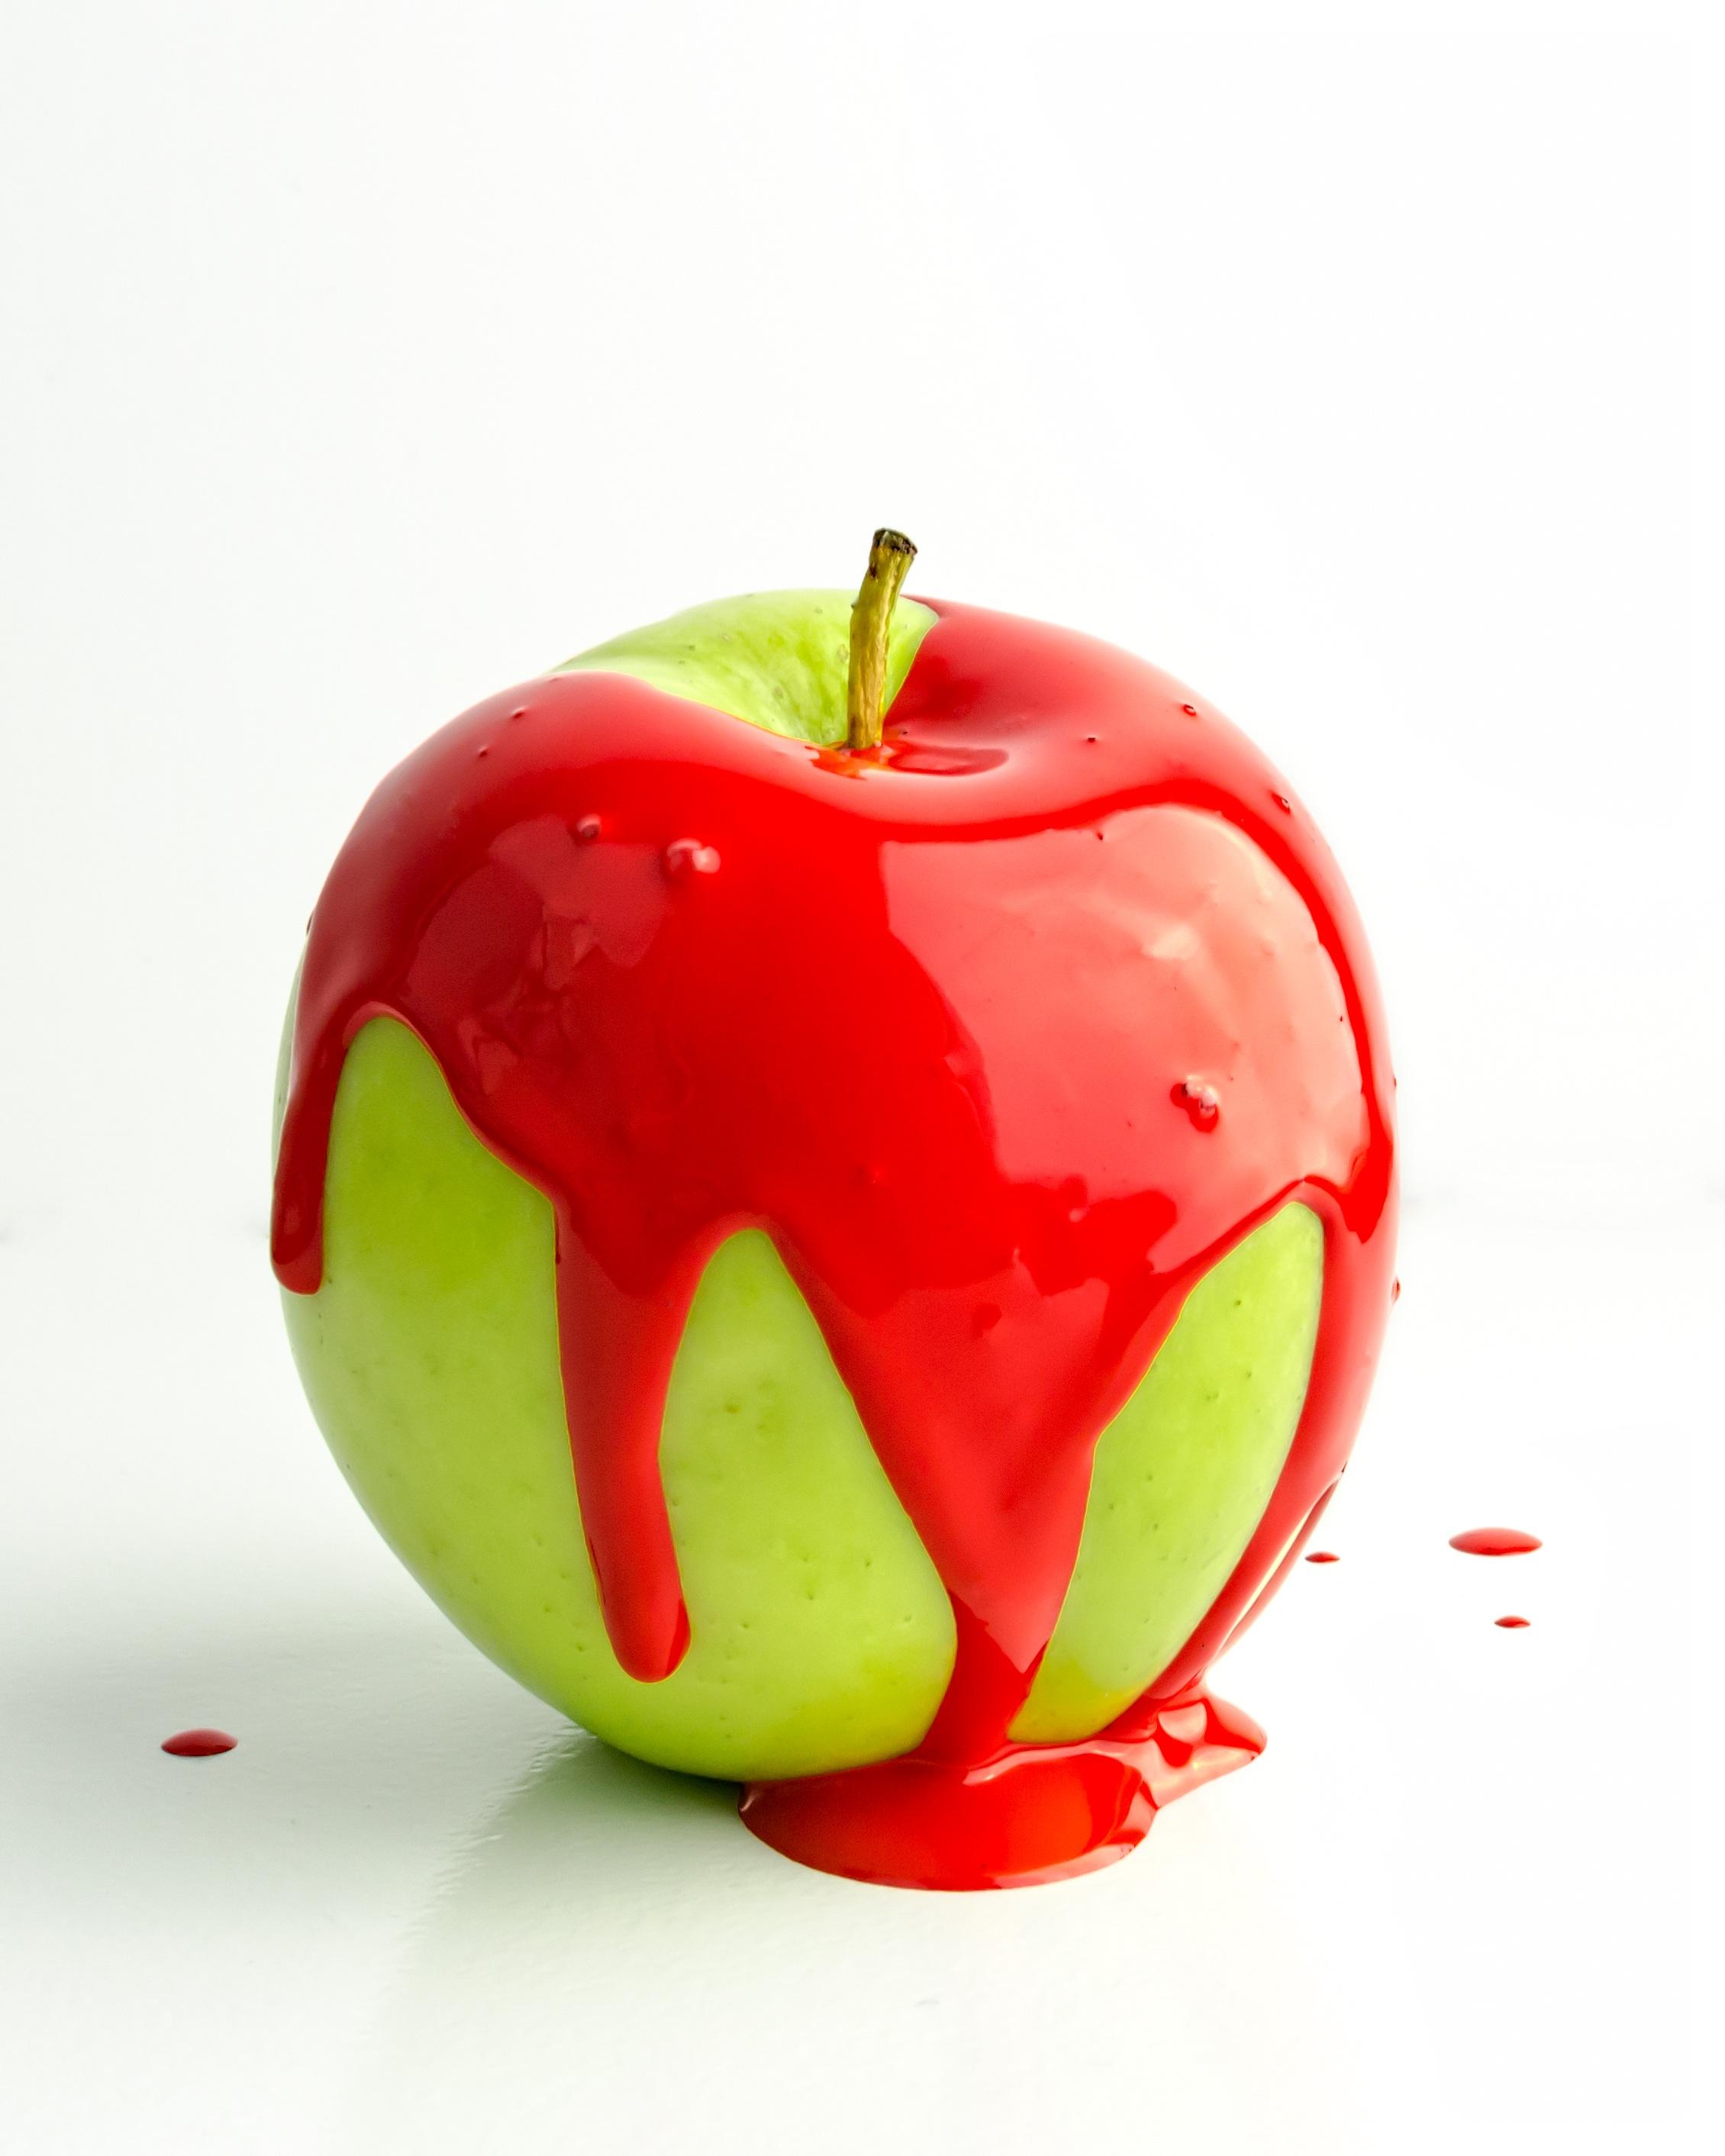 единорог креативные картинки яблок раз наверное